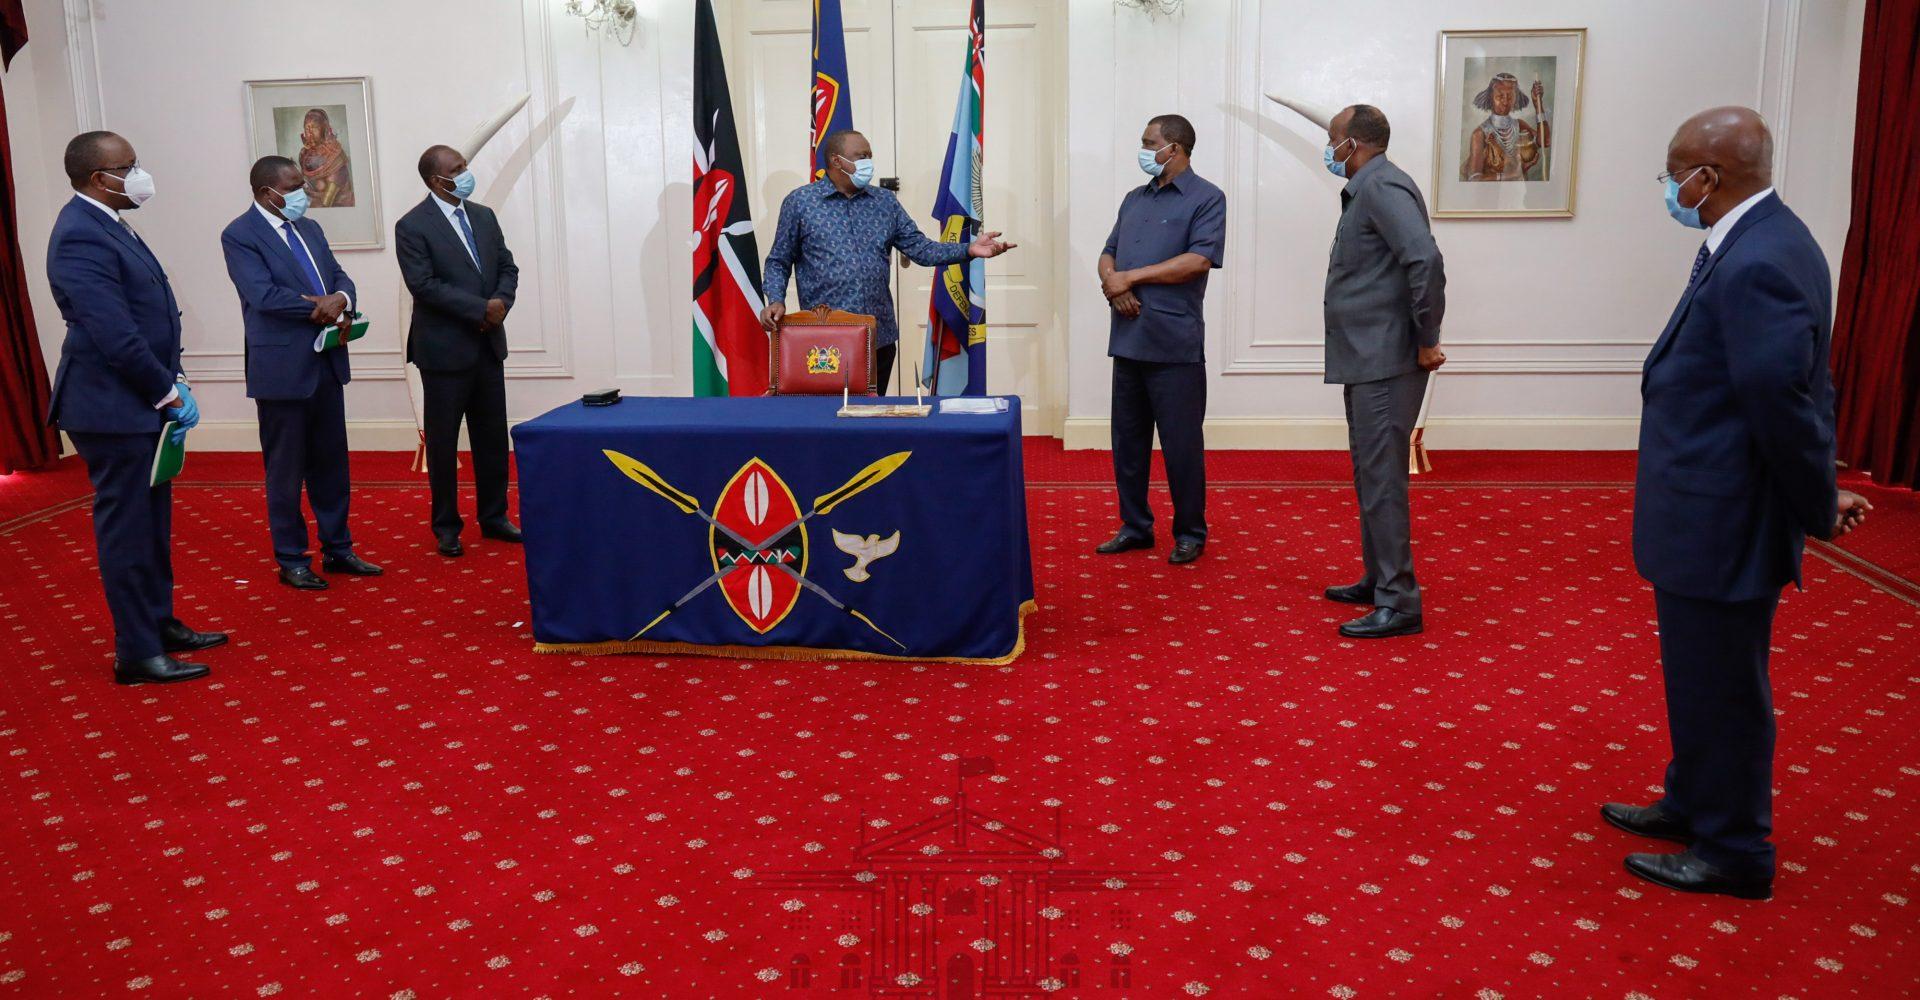 Aden Duale meets Uhuru Kenyatta just before National Assembly changes